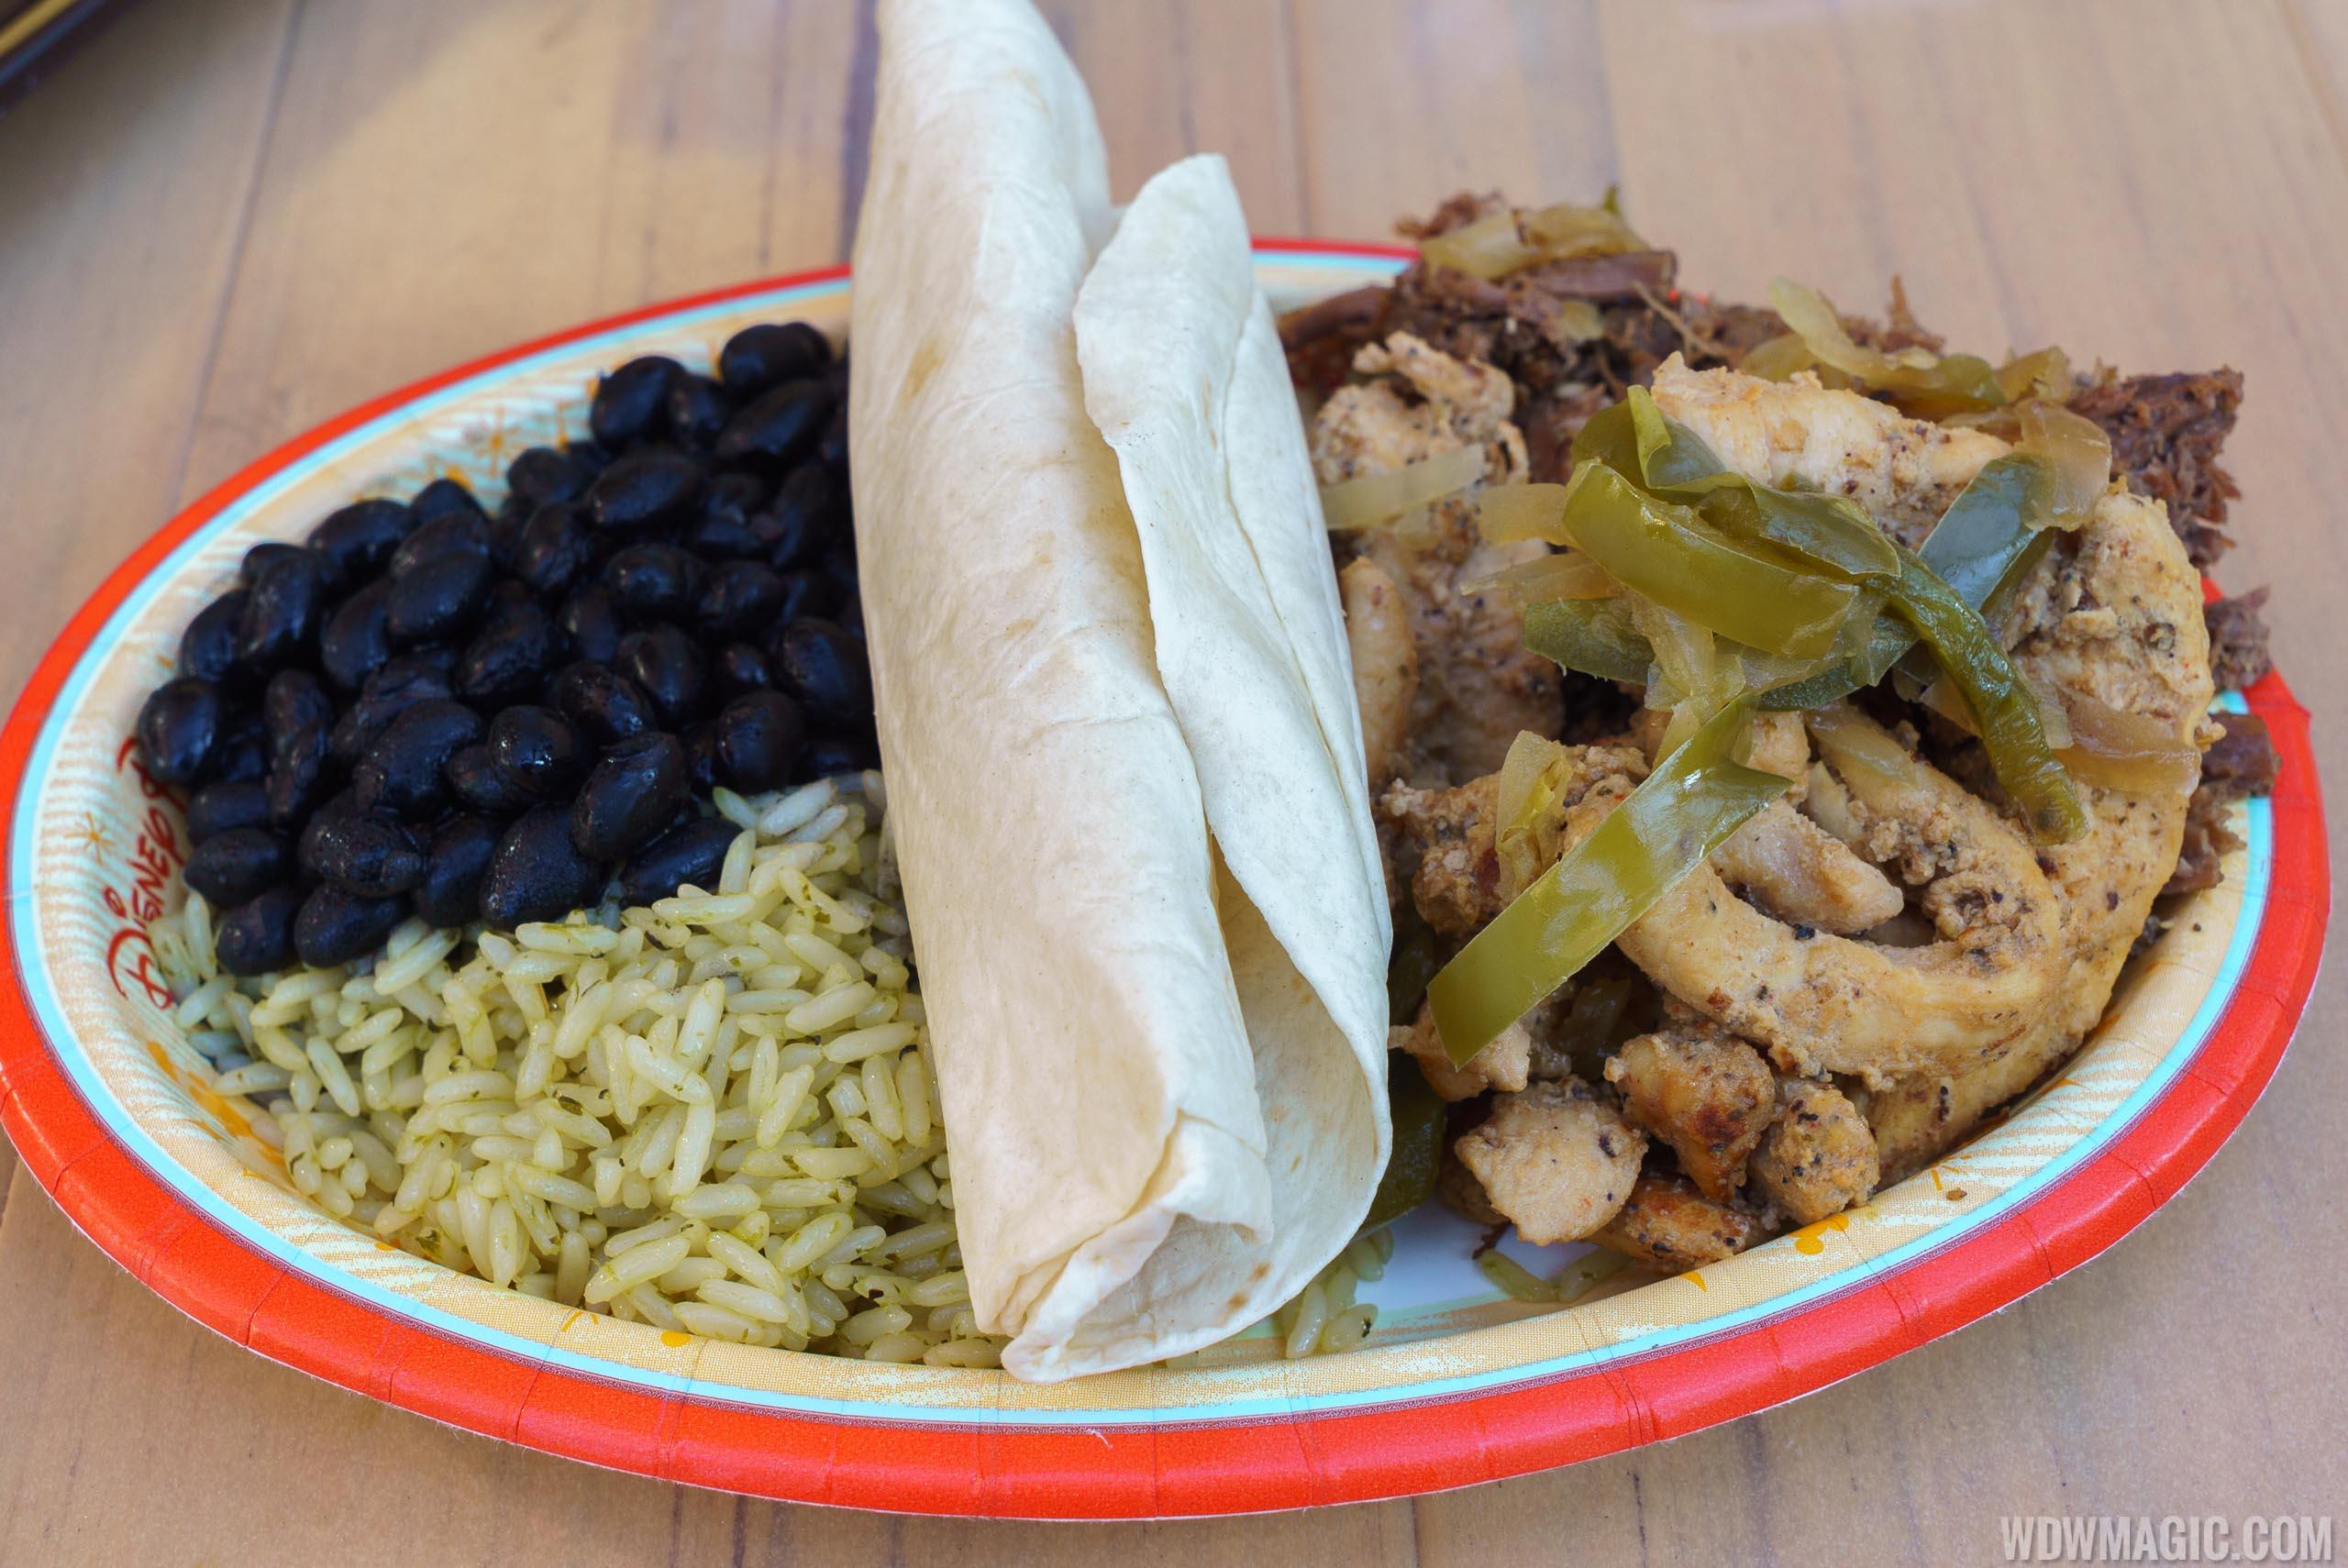 Pecos Bill Cafe - Fajita, Burritos, Nachos and Toppings Bar